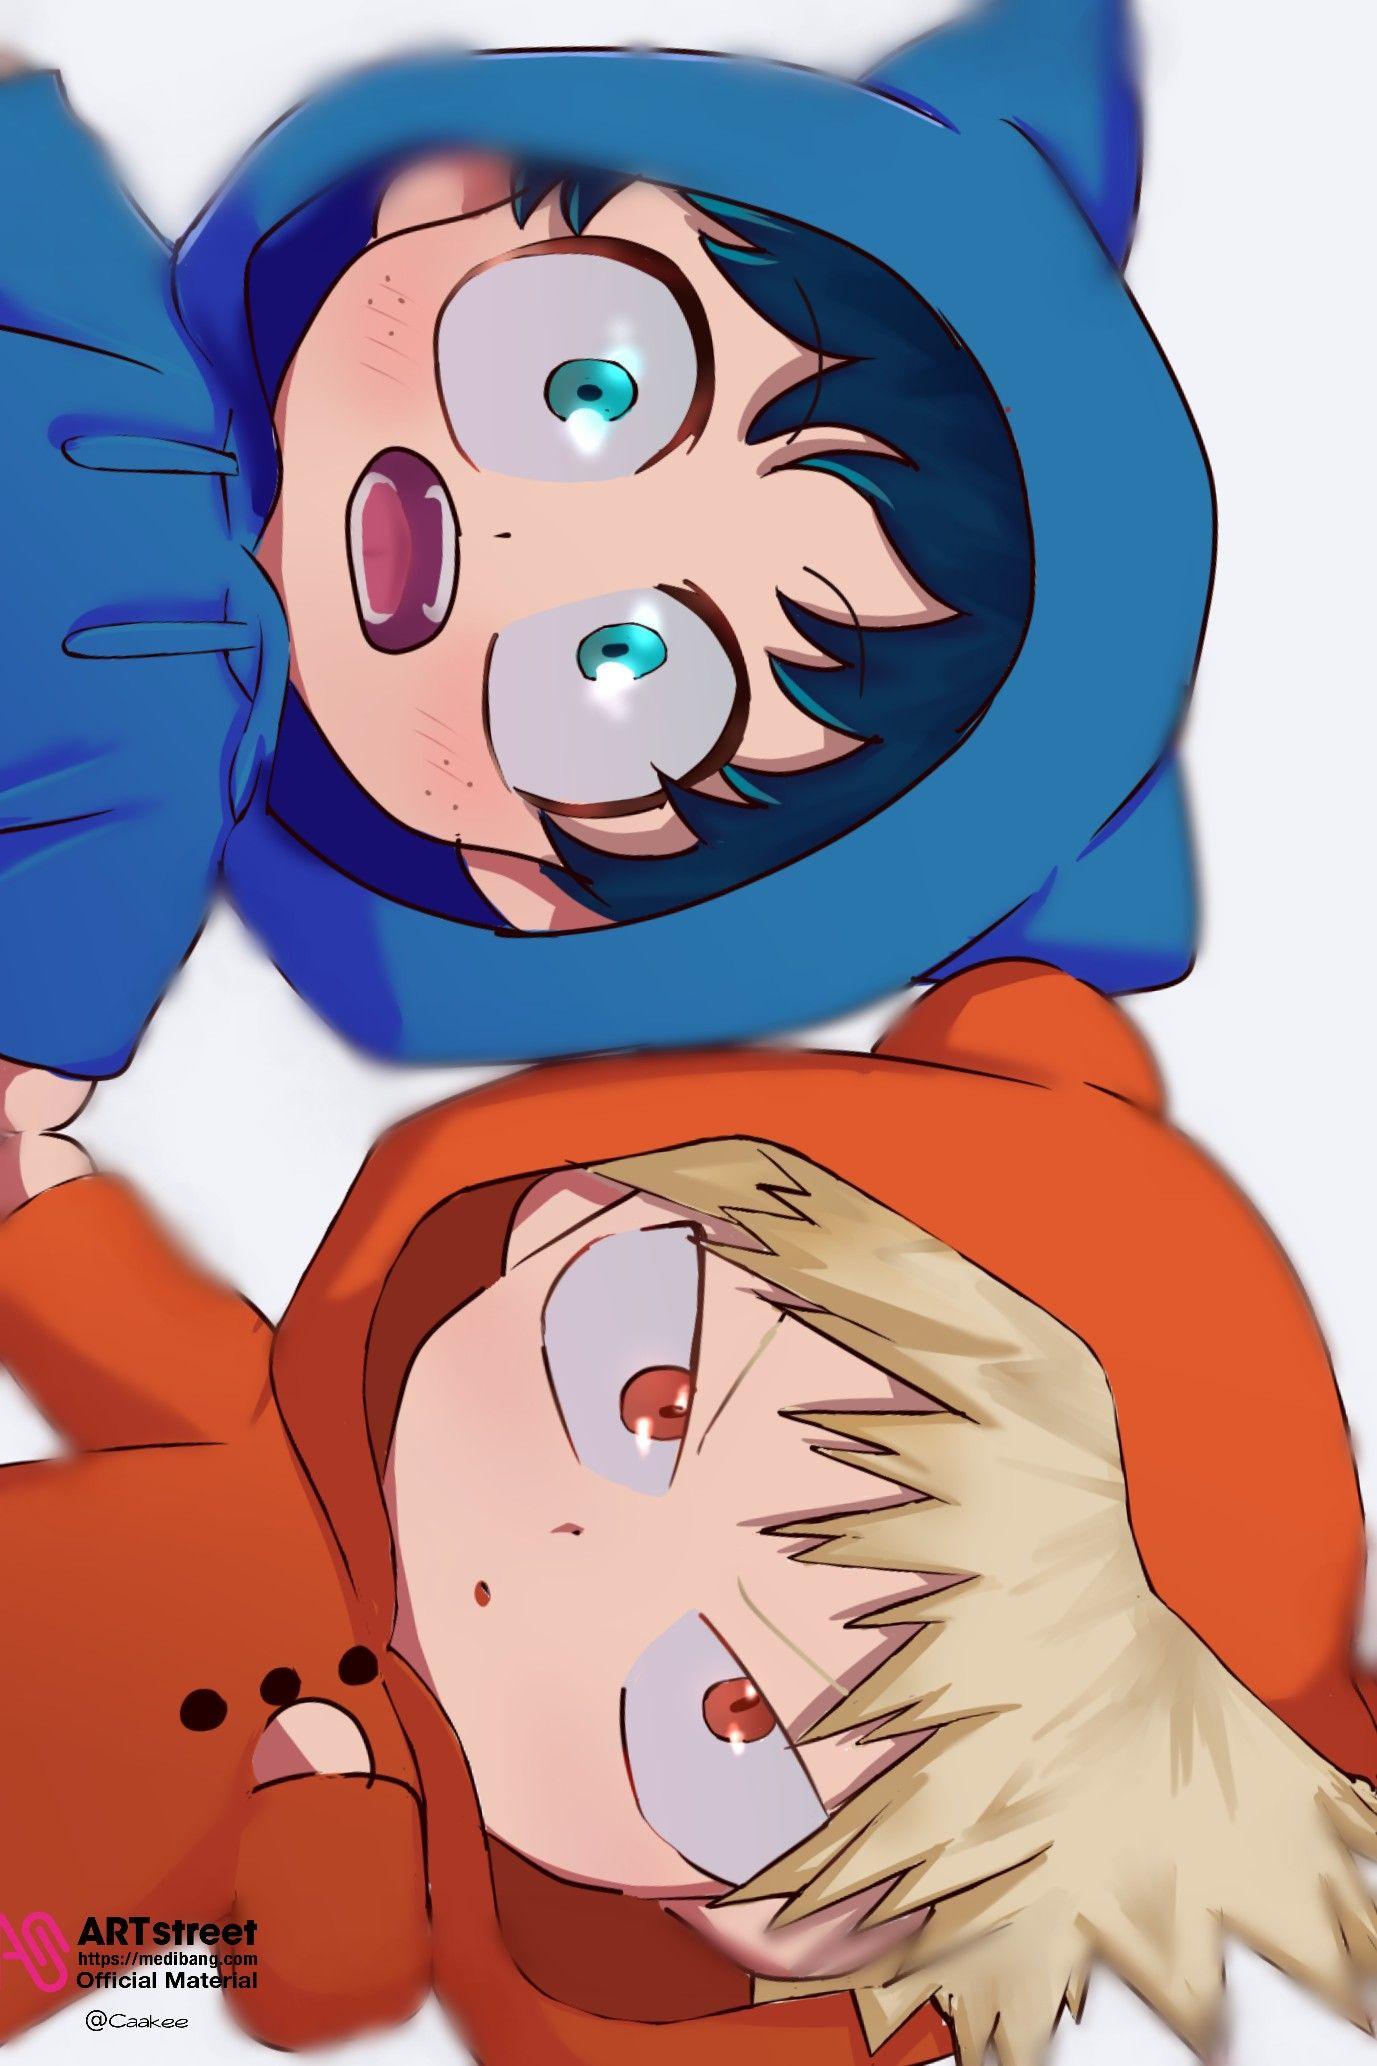 Midoriya Izuku And Katsuki Bakugo Animal Ears Cute Boku No Hero Academia Anime Child My Hero Cute Anime Guys